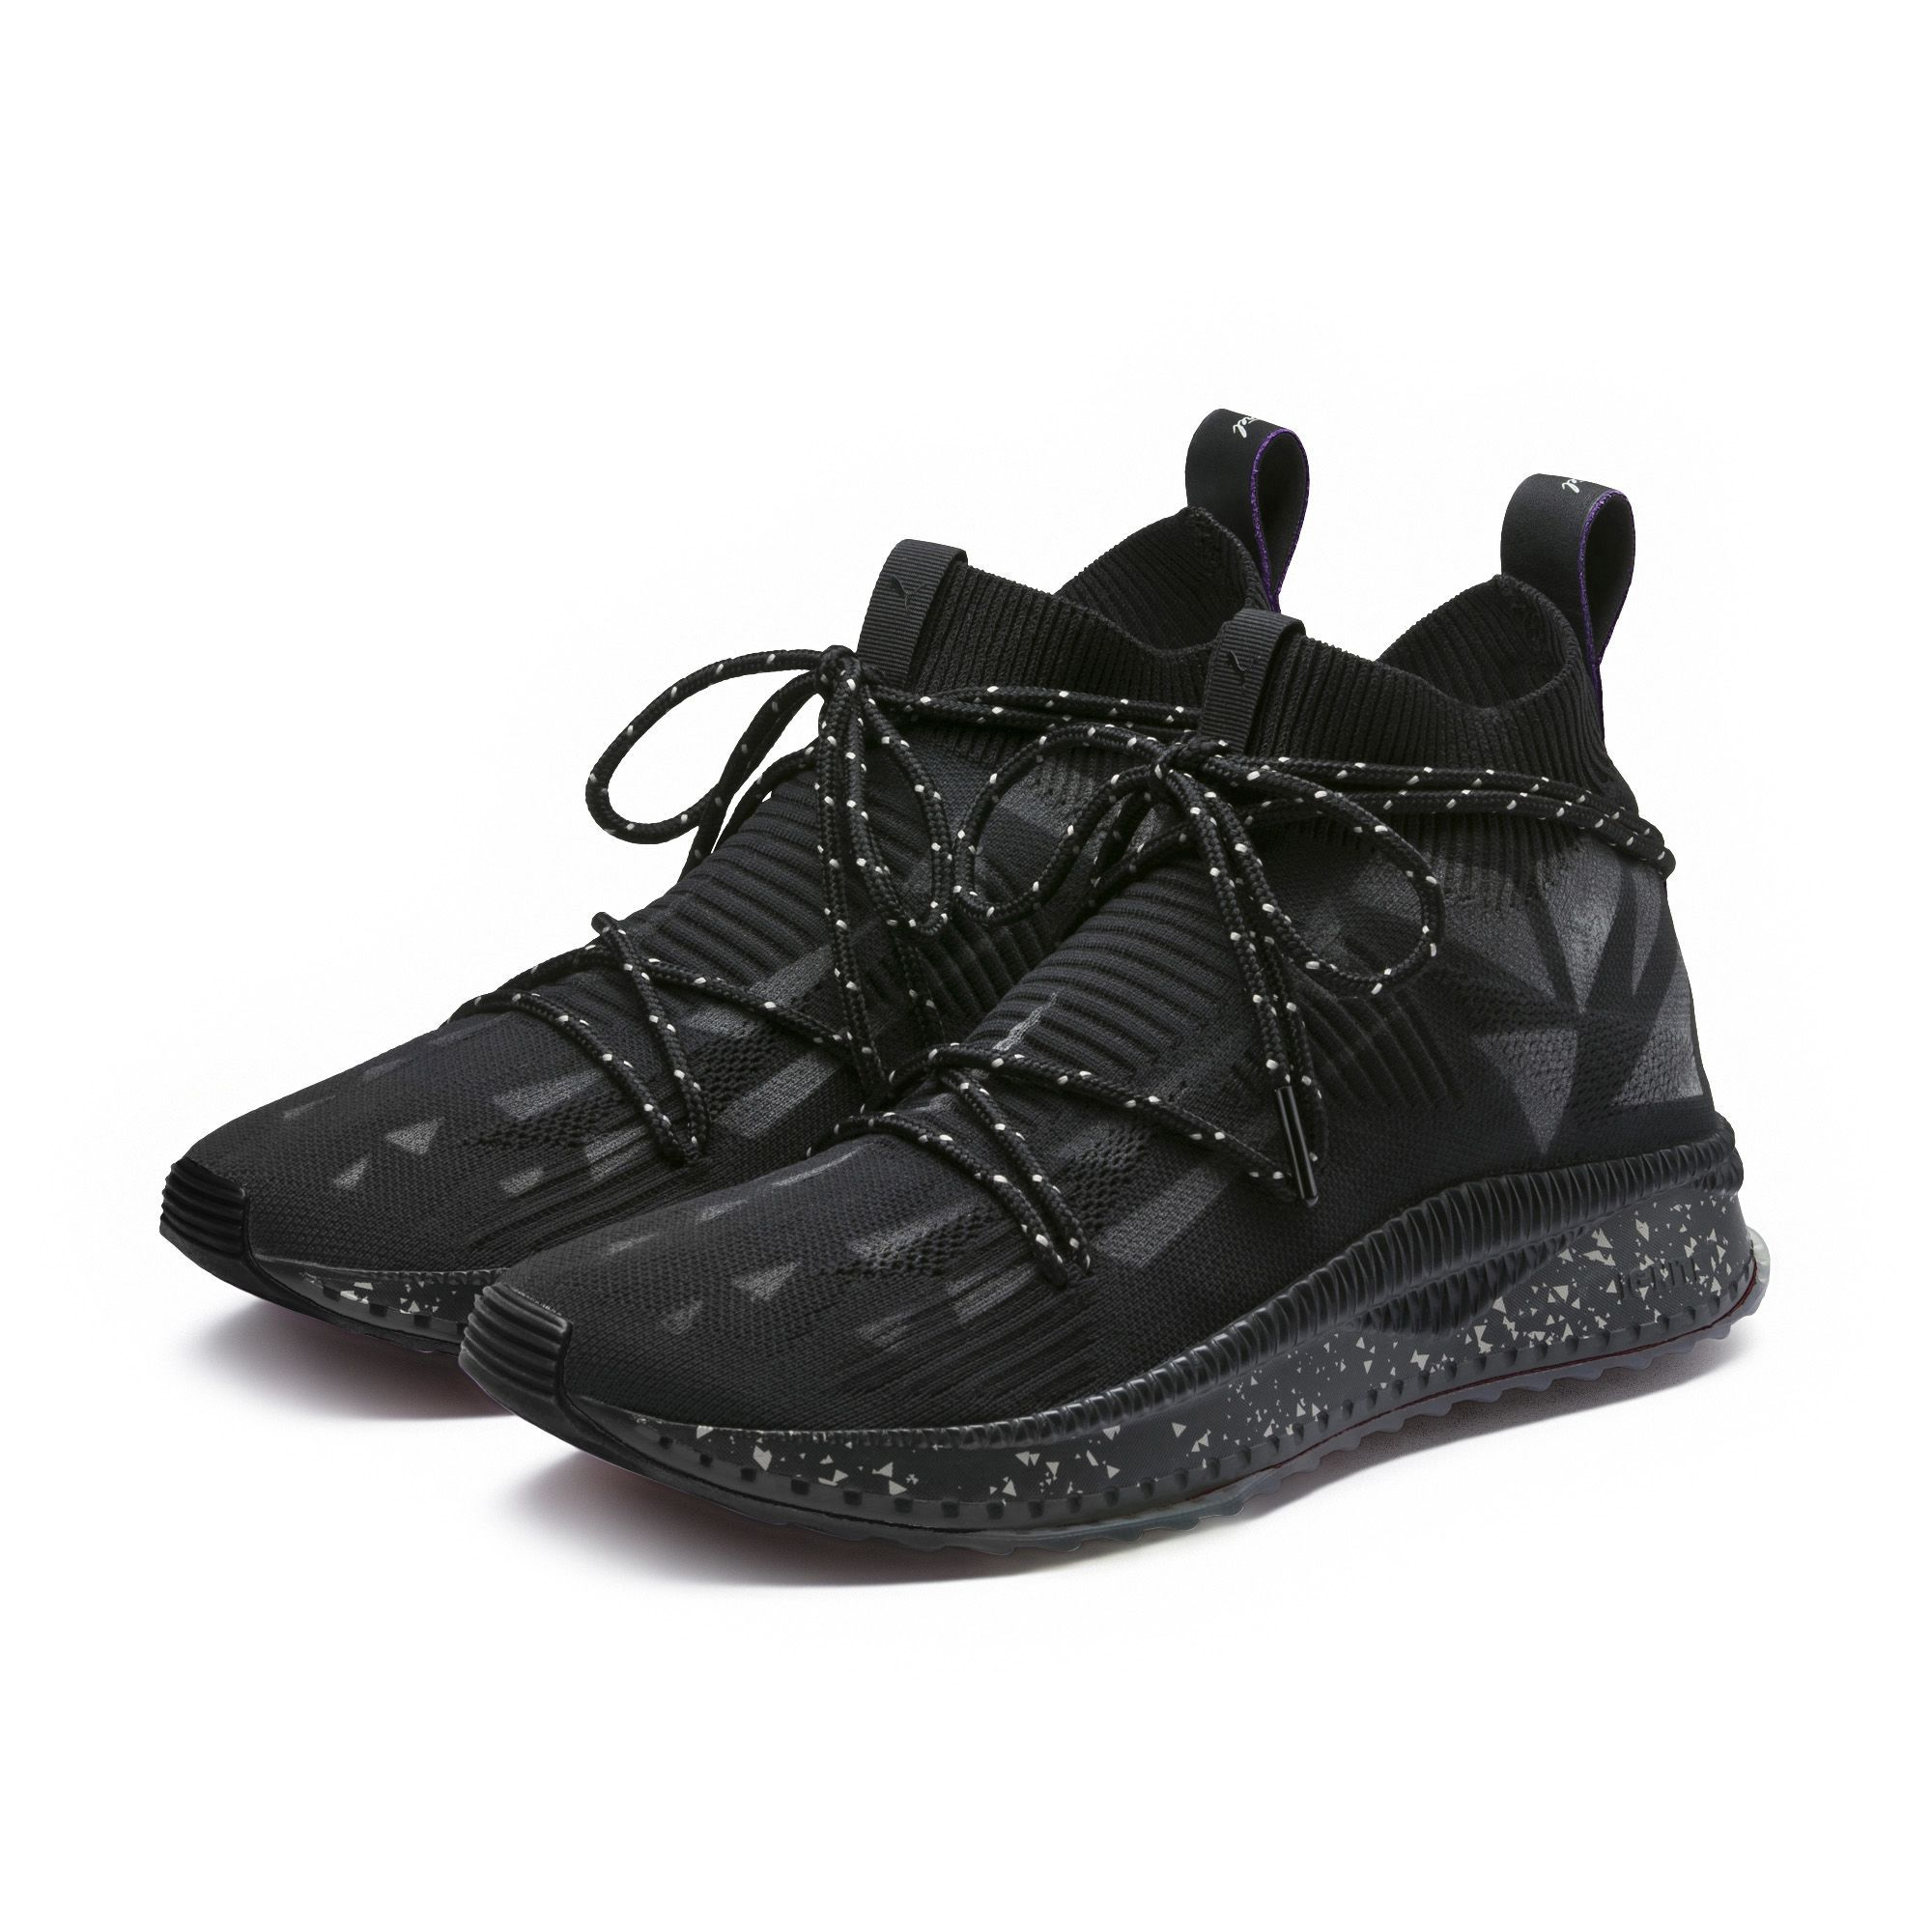 8675819016de31 PUMA x NATUREL TSUGI evoKNIT Sock Sneakers